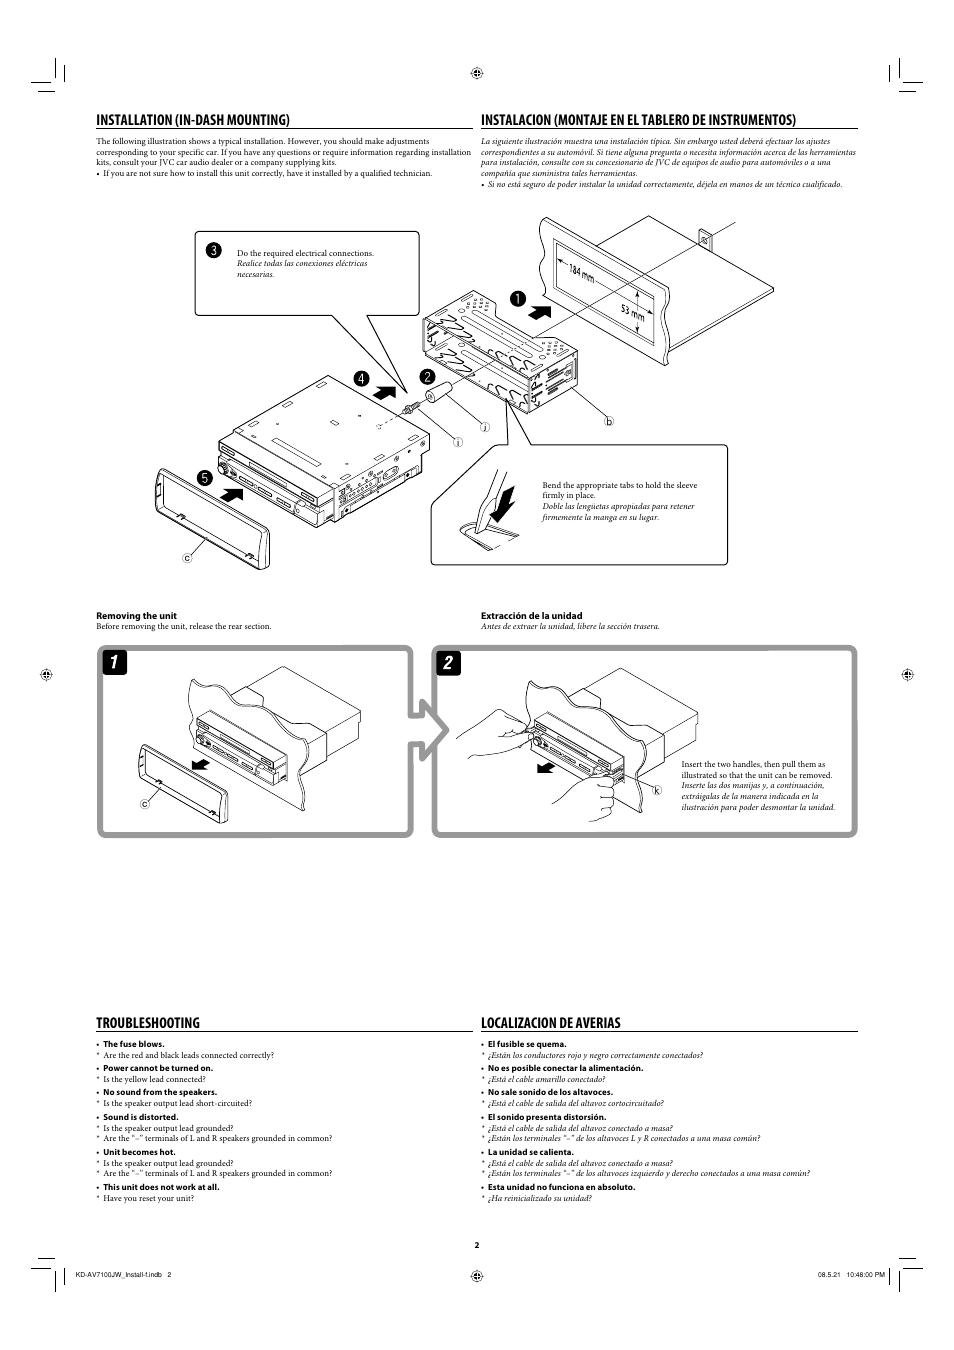 Installation (in-dash mounting), Troubleshooting, Localizacion de averias |  JVC KD